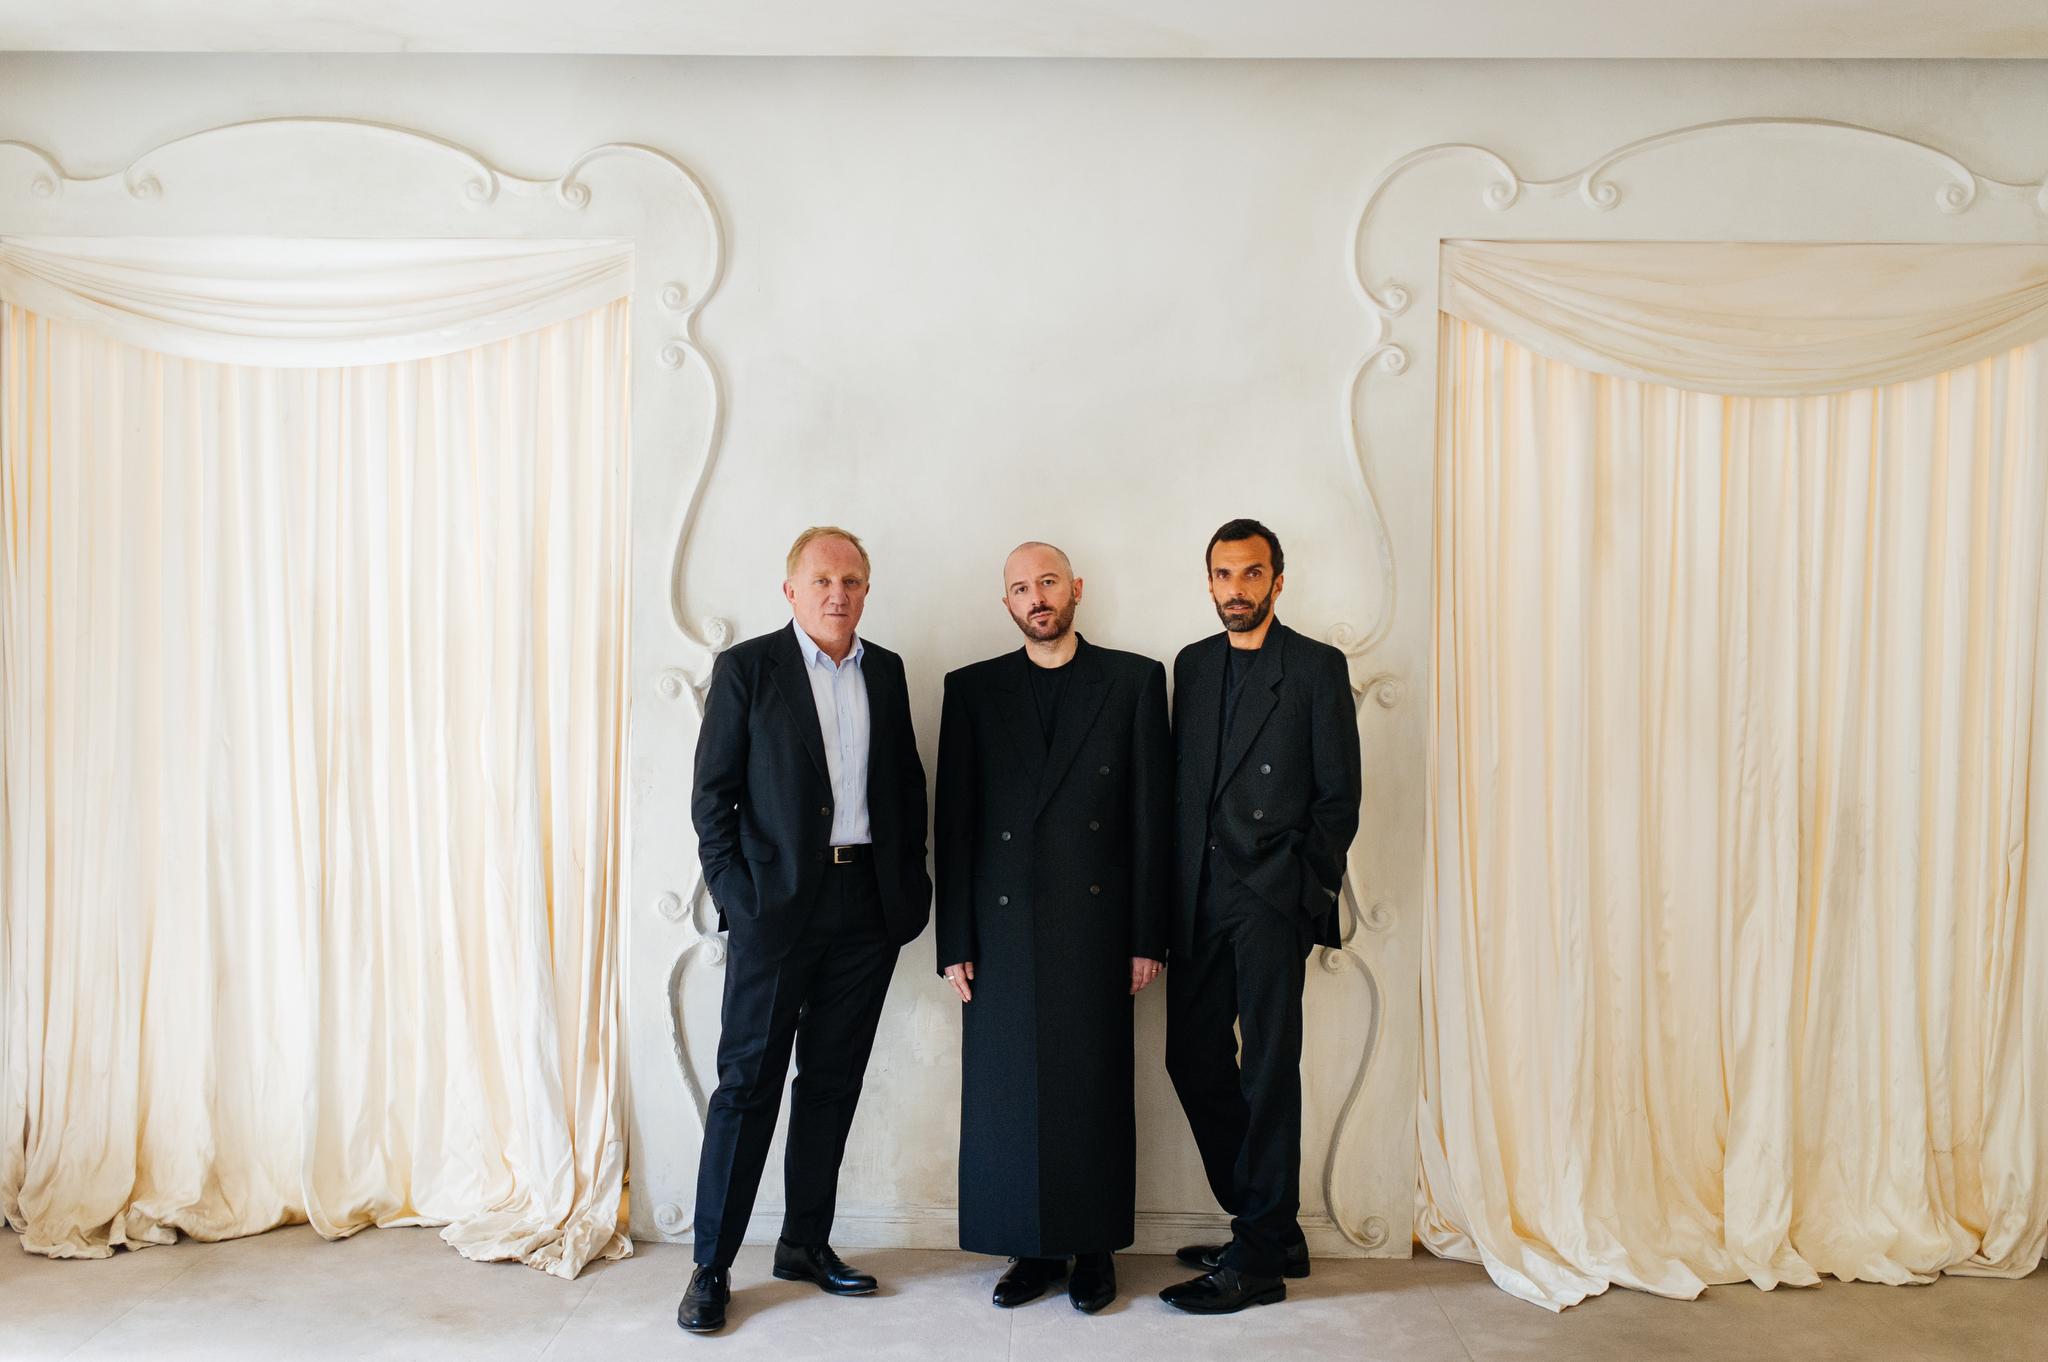 François-Henri Pinault, Demna Gvasalia and Cédric Charbit